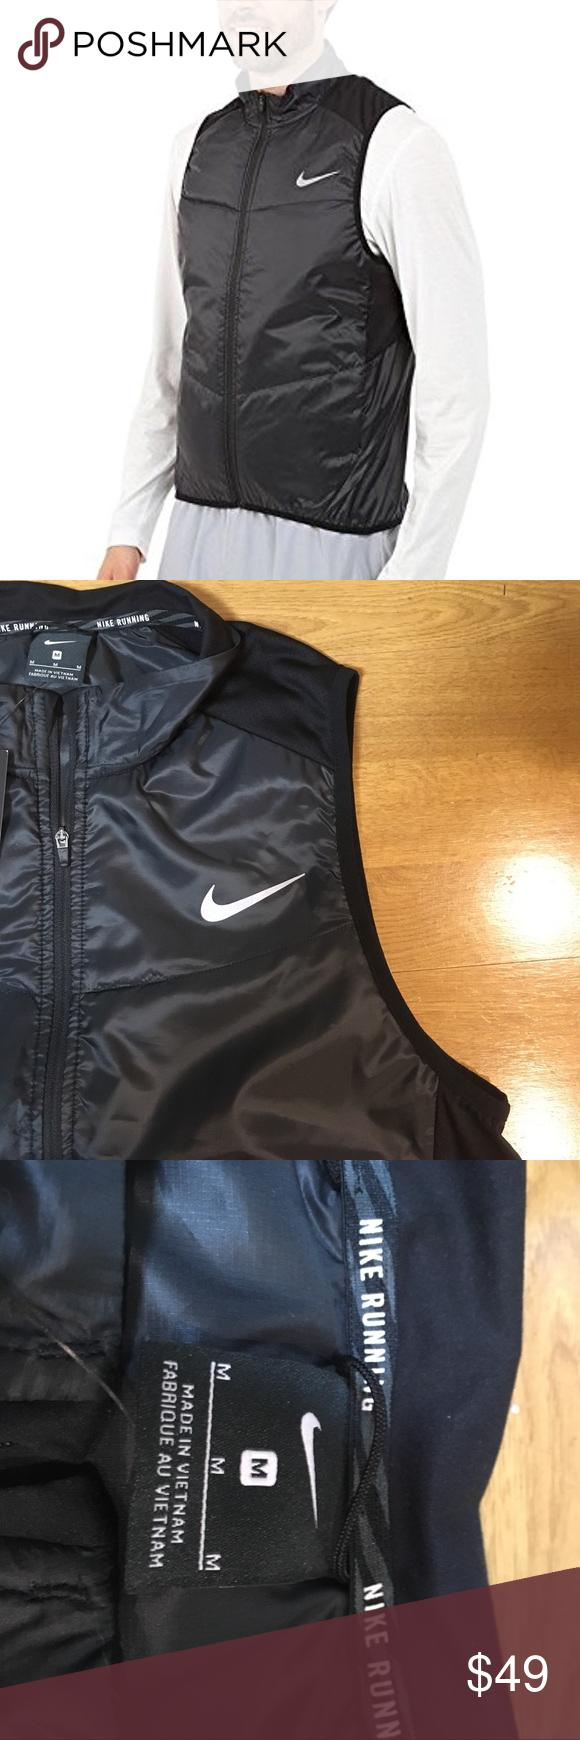 820607b71056 Men s Nike Polyfill Running Vest Nike Polyfill Men s Running Vest keeps you  running through the seasons